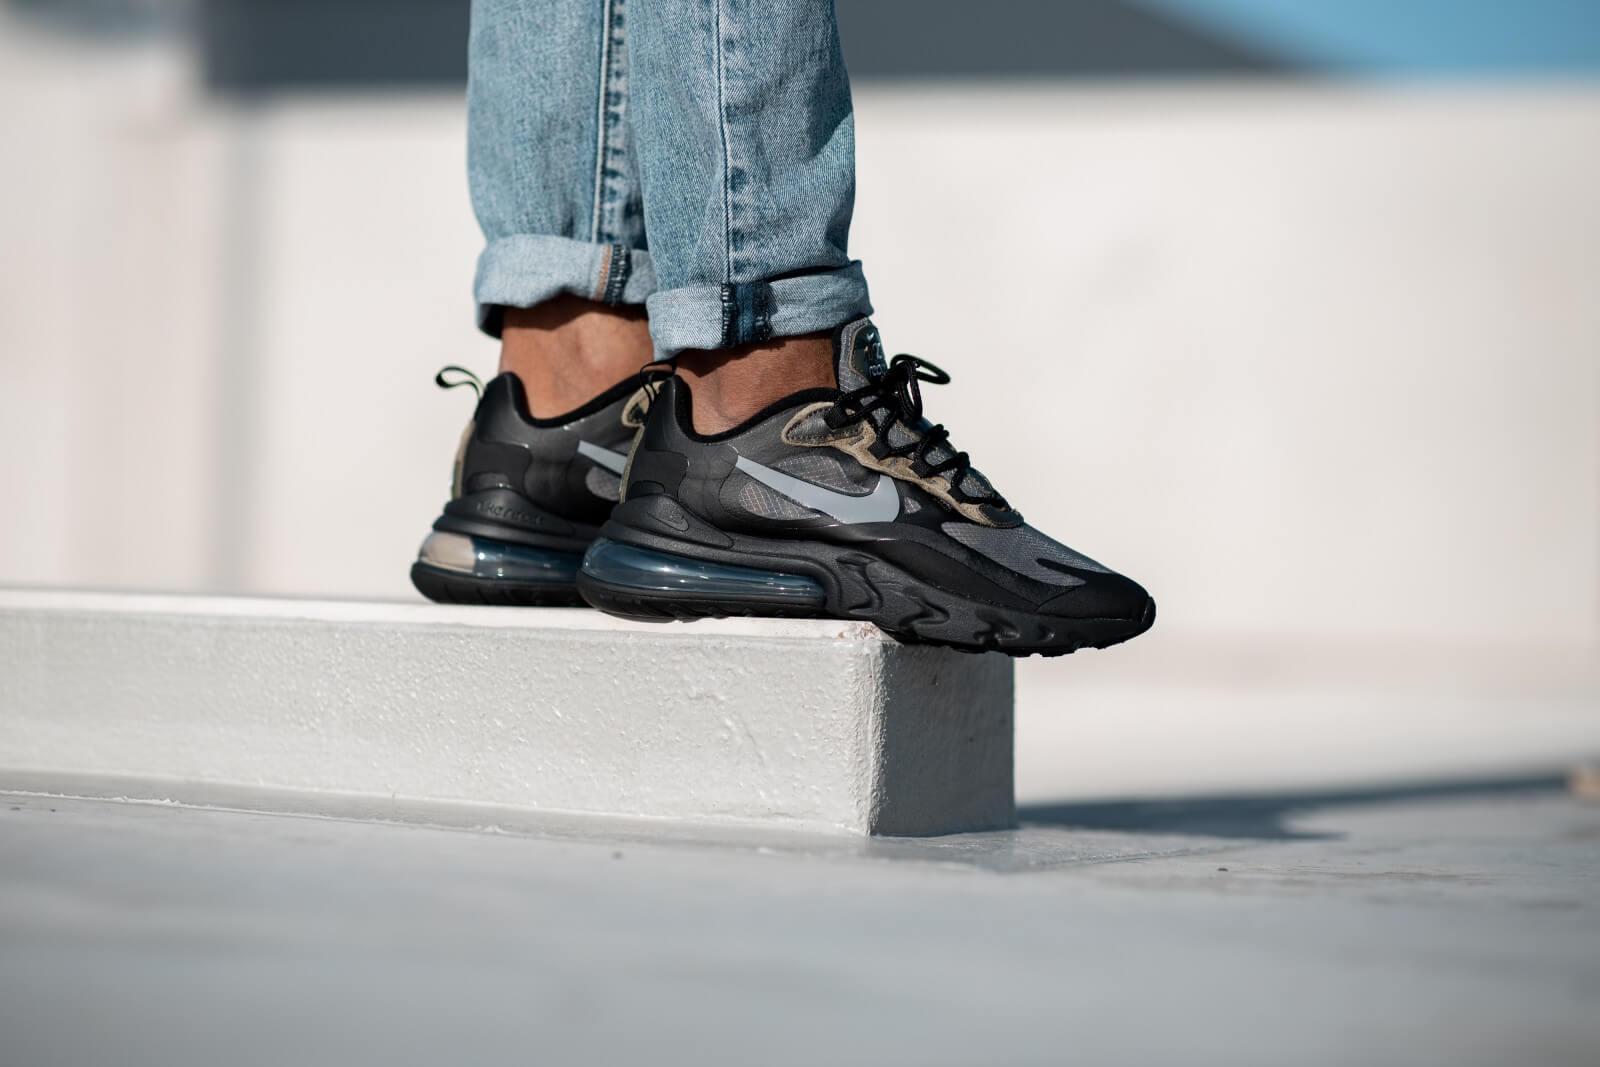 Nike Air Max 270 React BlackWhite Anthracite CT5528 001